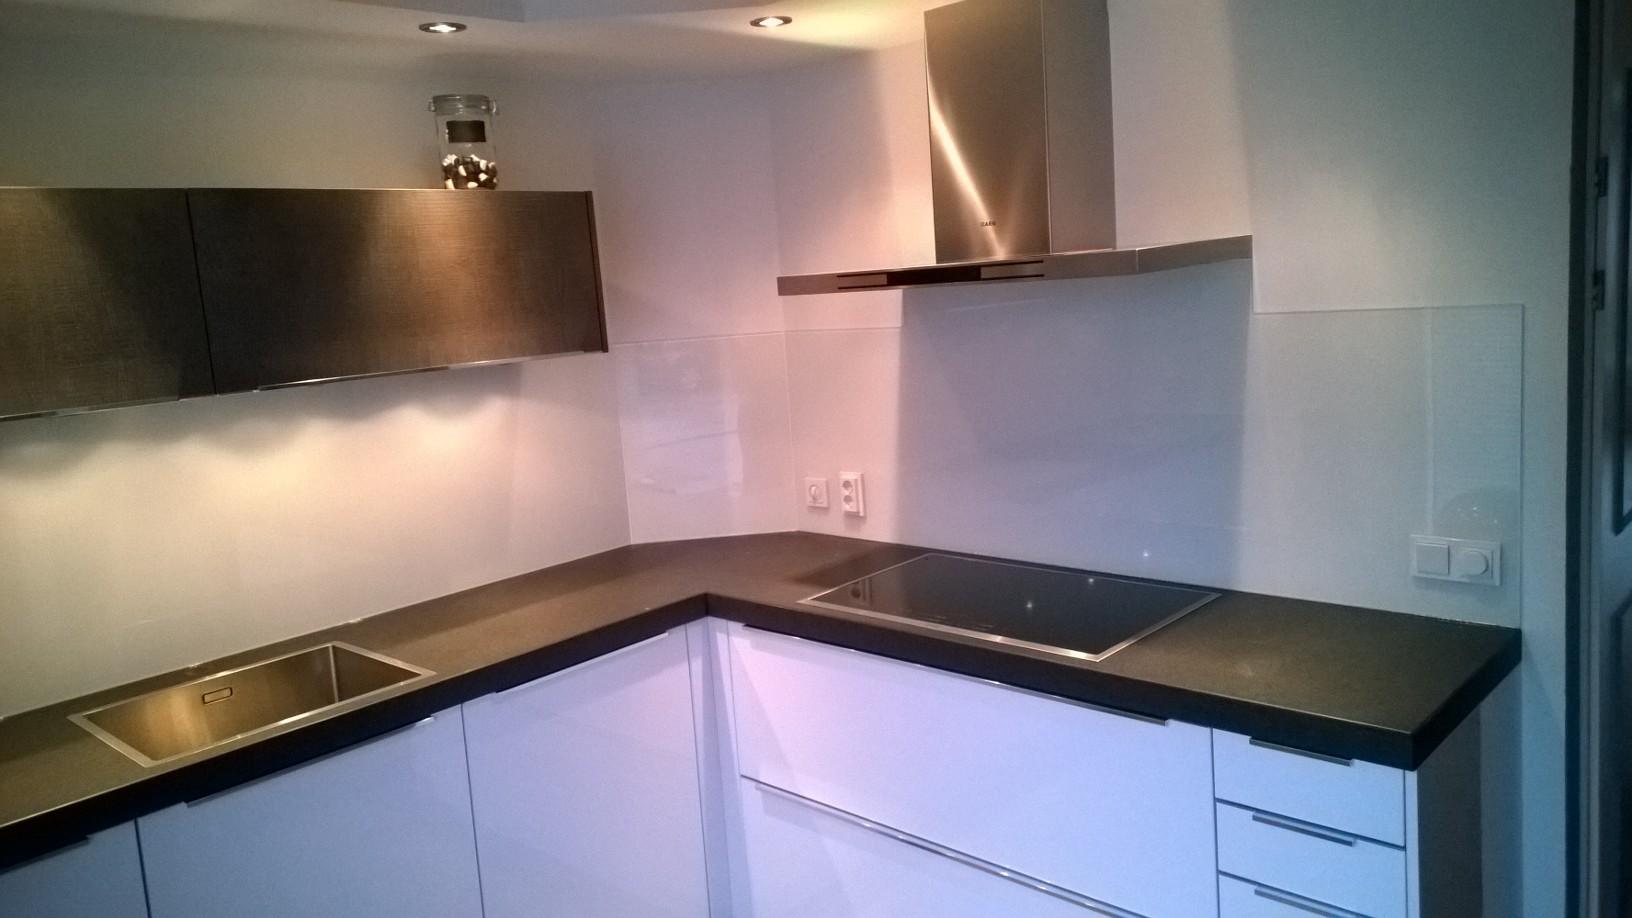 Achterwand keuken u fvs glas u uw glasleverancier en glaszetter in